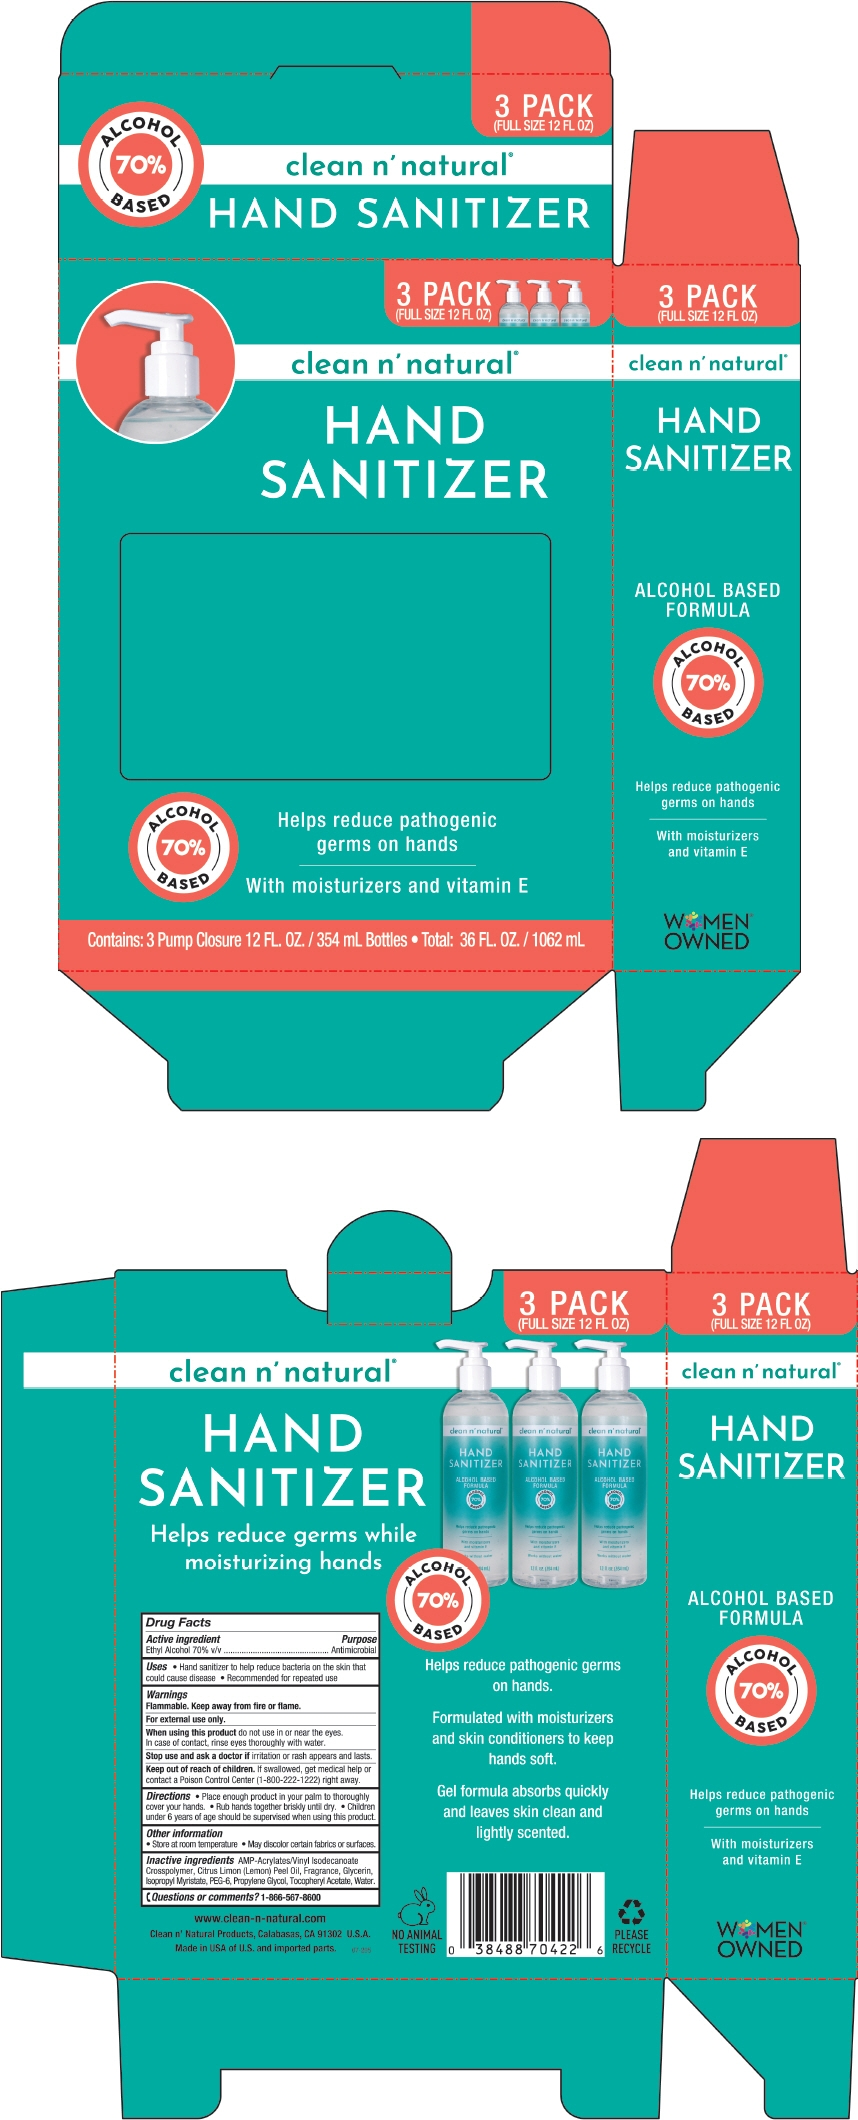 PRINCIPAL DISPLAY PANEL - 3 Bottle Carton